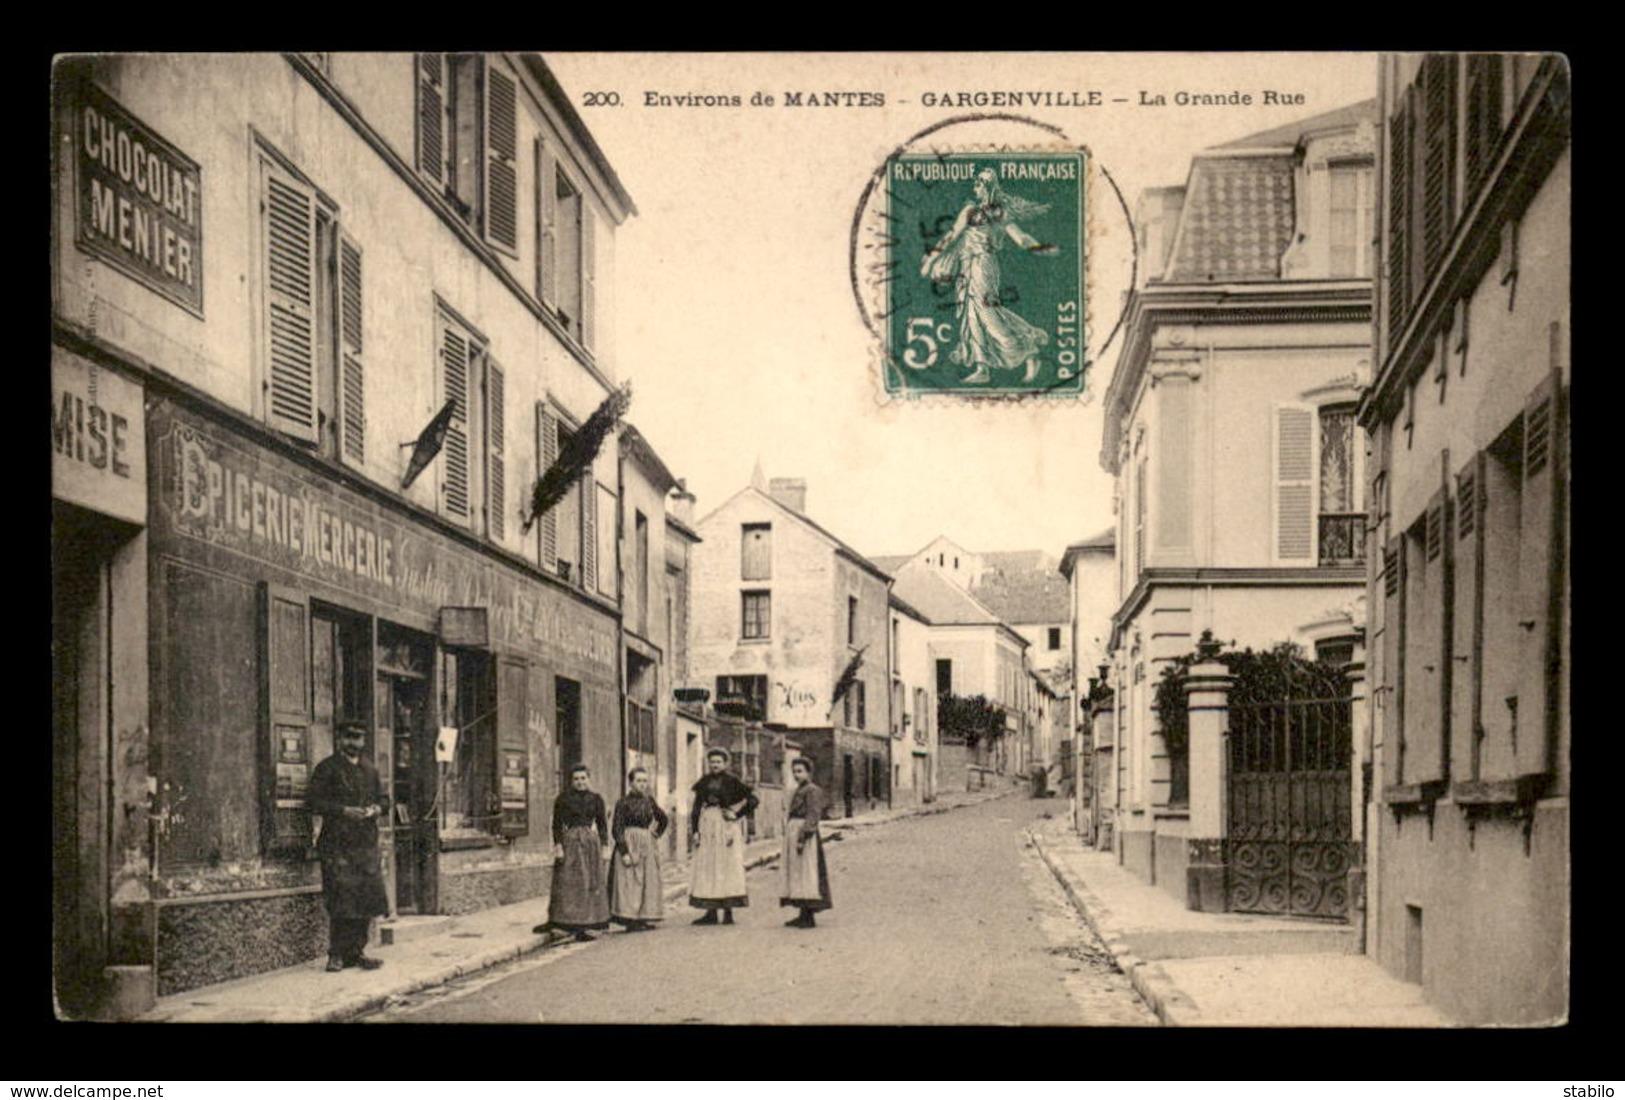 78 - GARGENVILLE - LA GRANDE RUE - EPICERIE GUSTAVE DUBOCQ - Gargenville